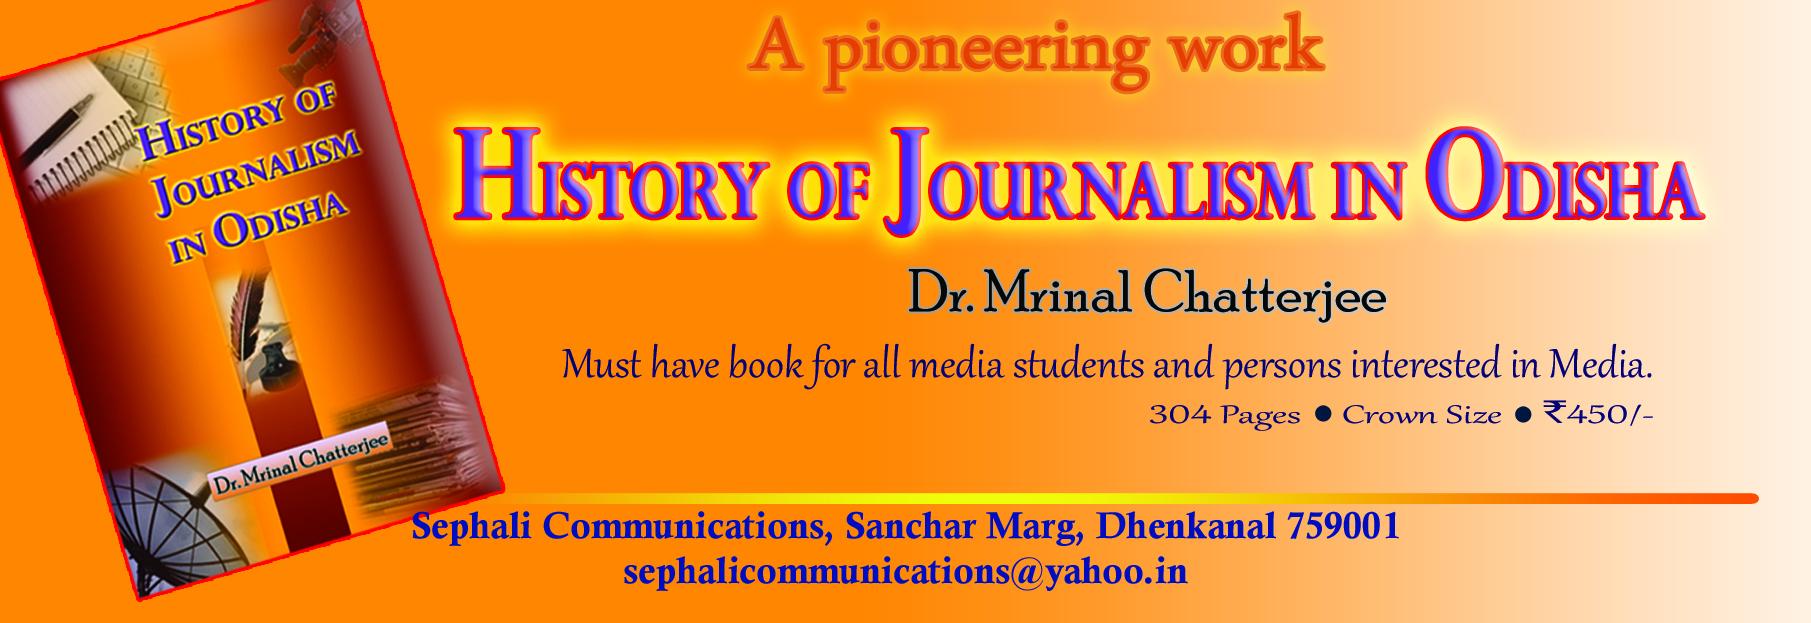 history involving sporting journalism